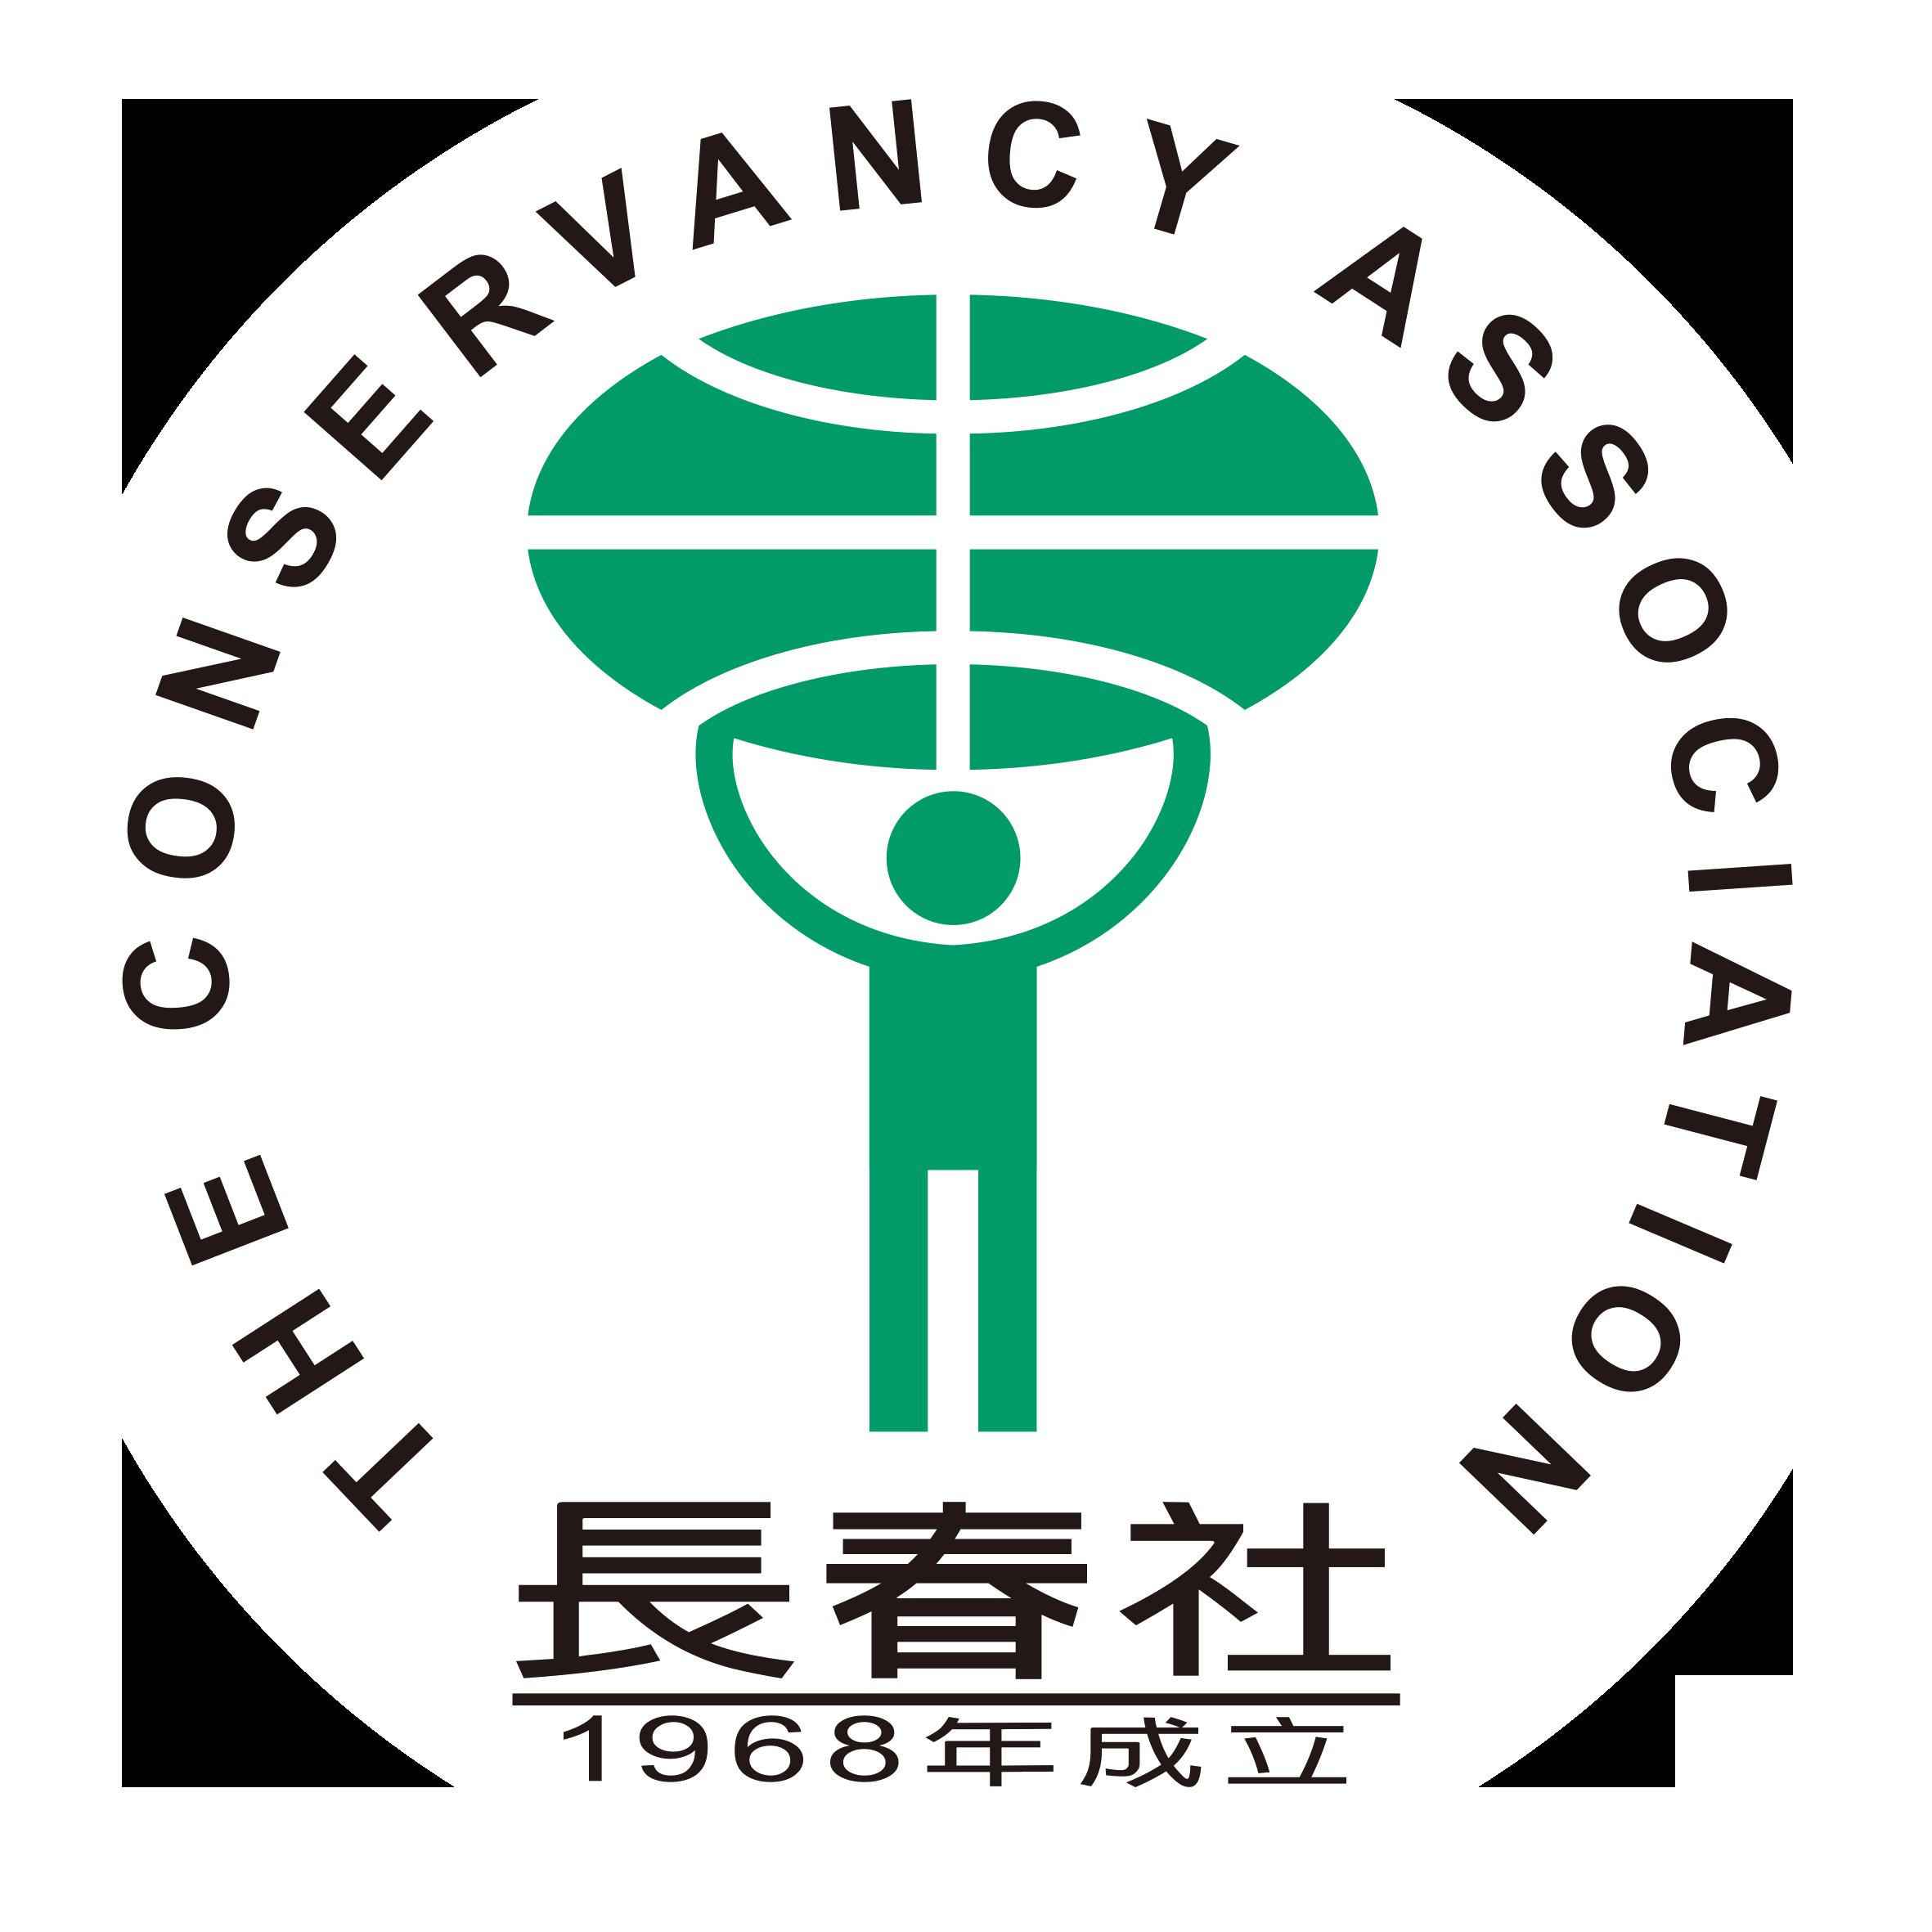 The Conservancy Association